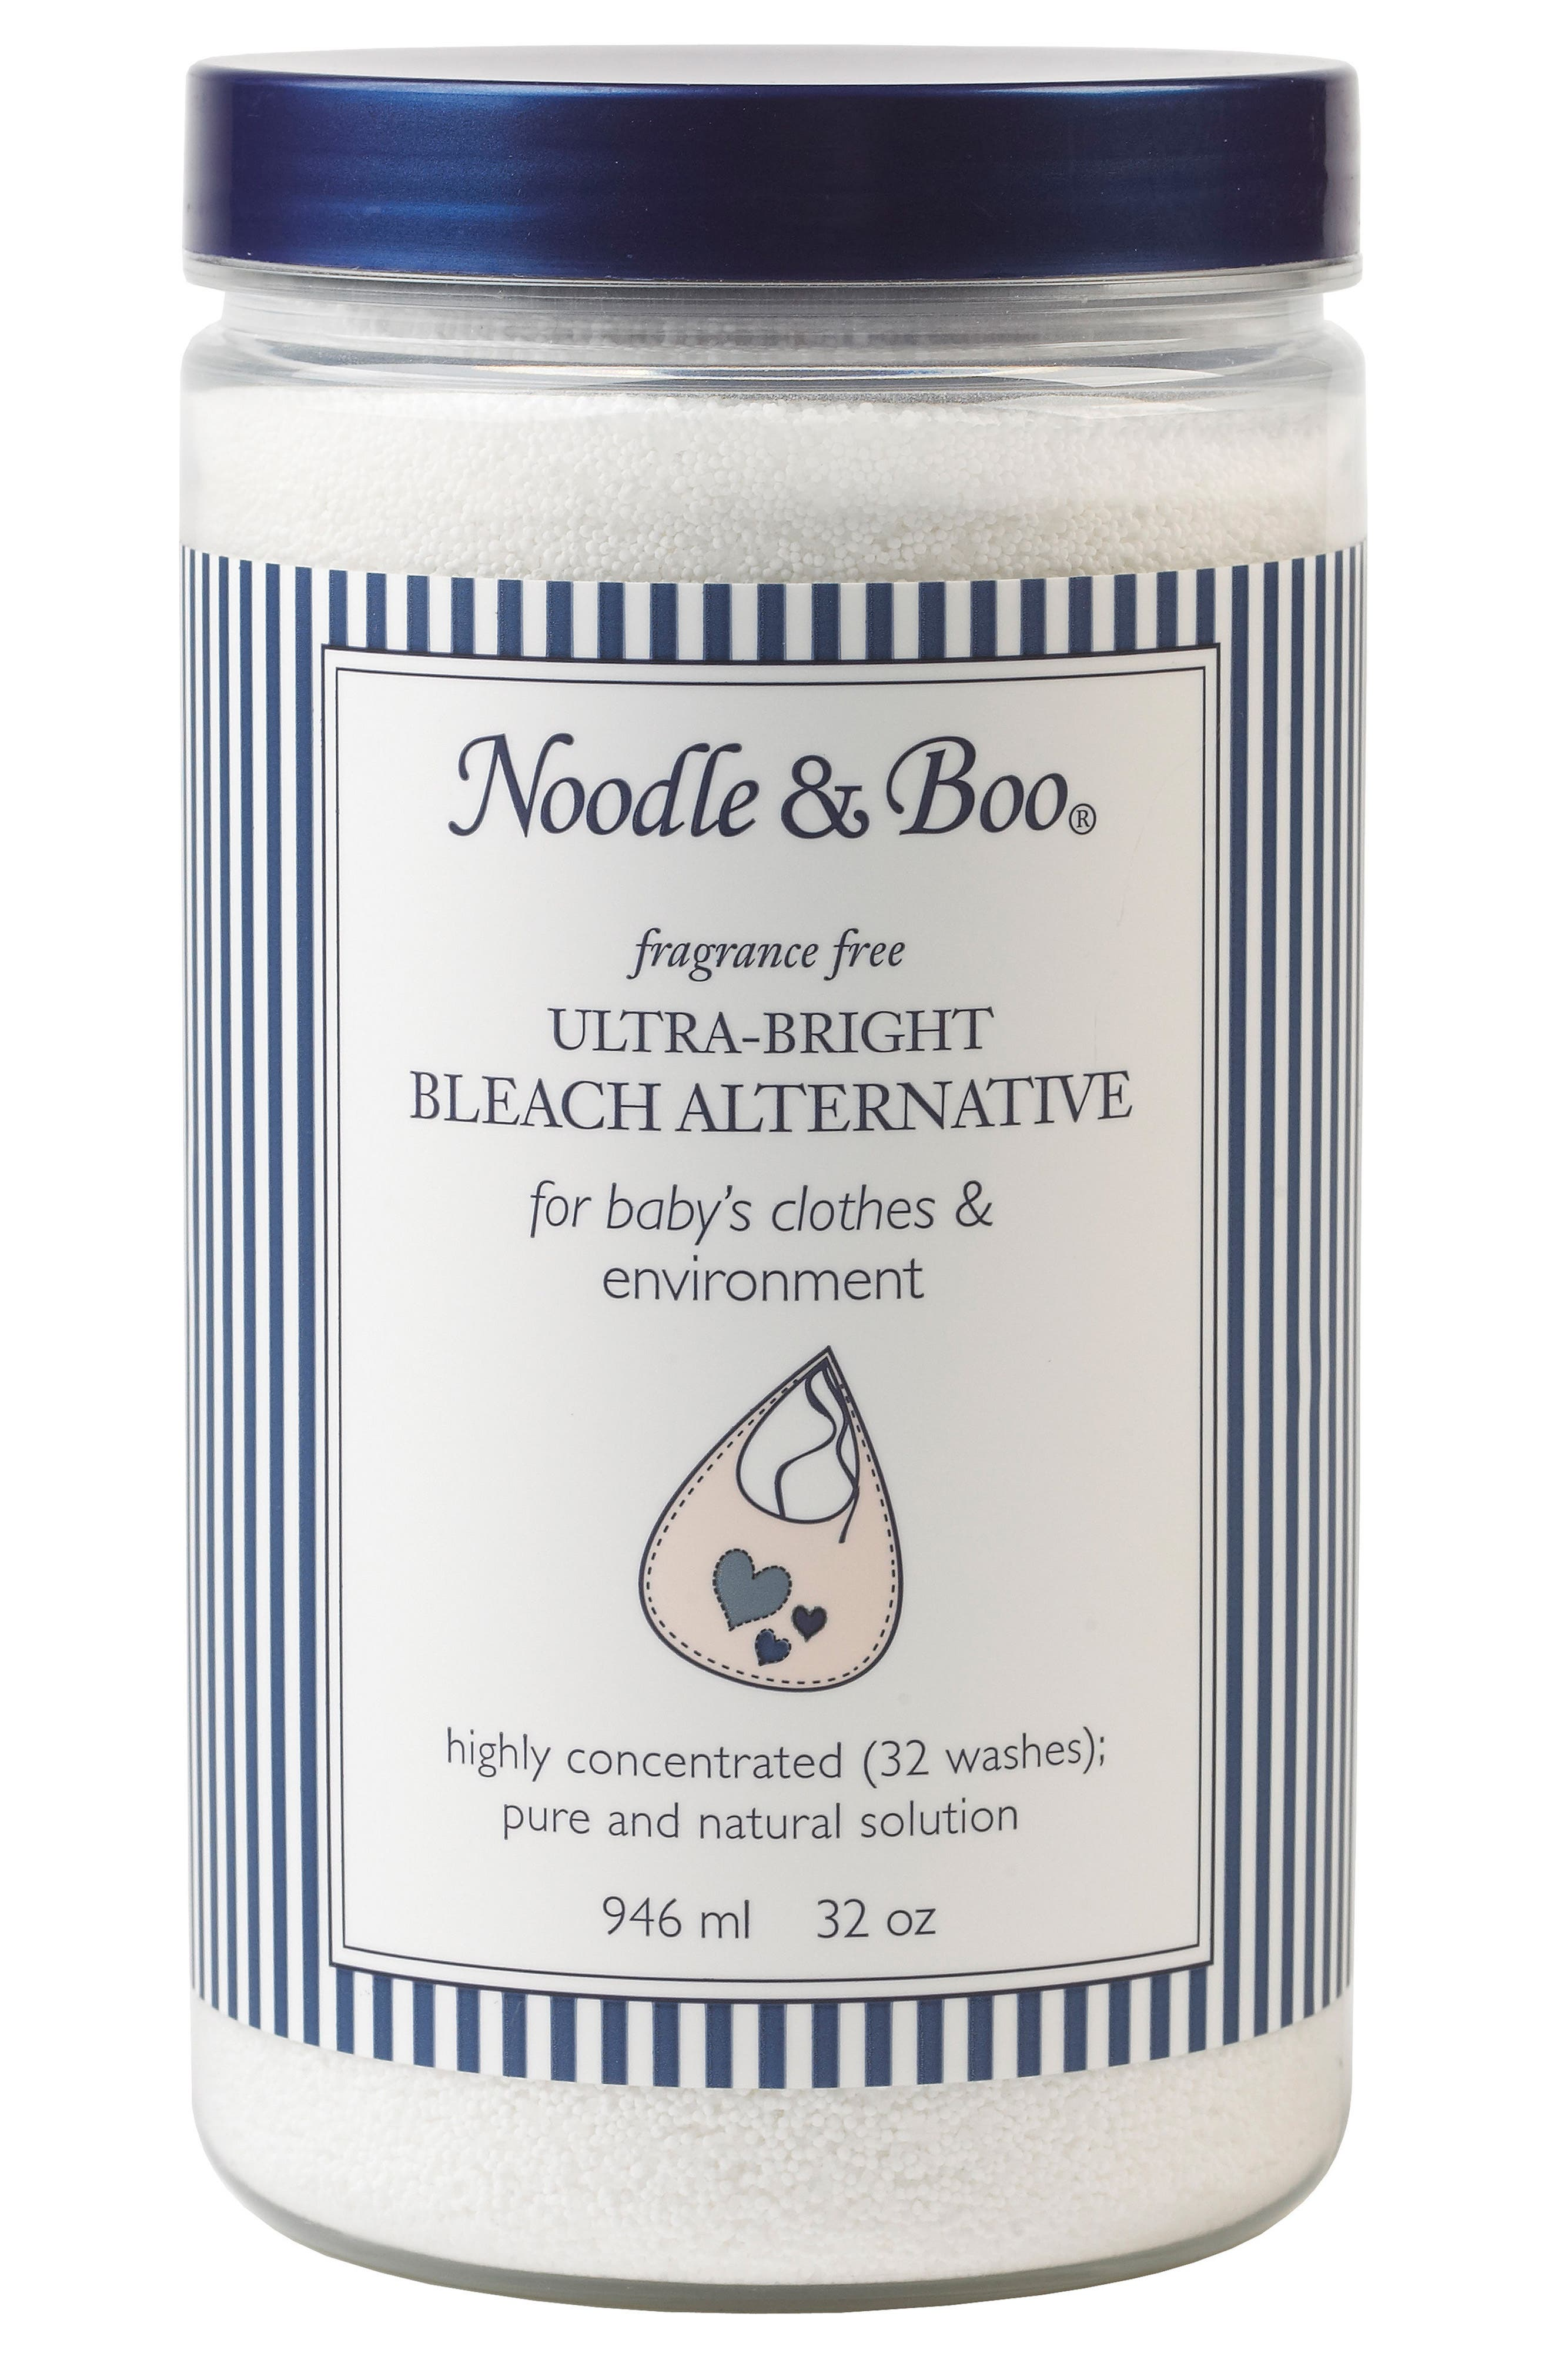 Noodle & Boo Ultra Bright Bleach Alternative